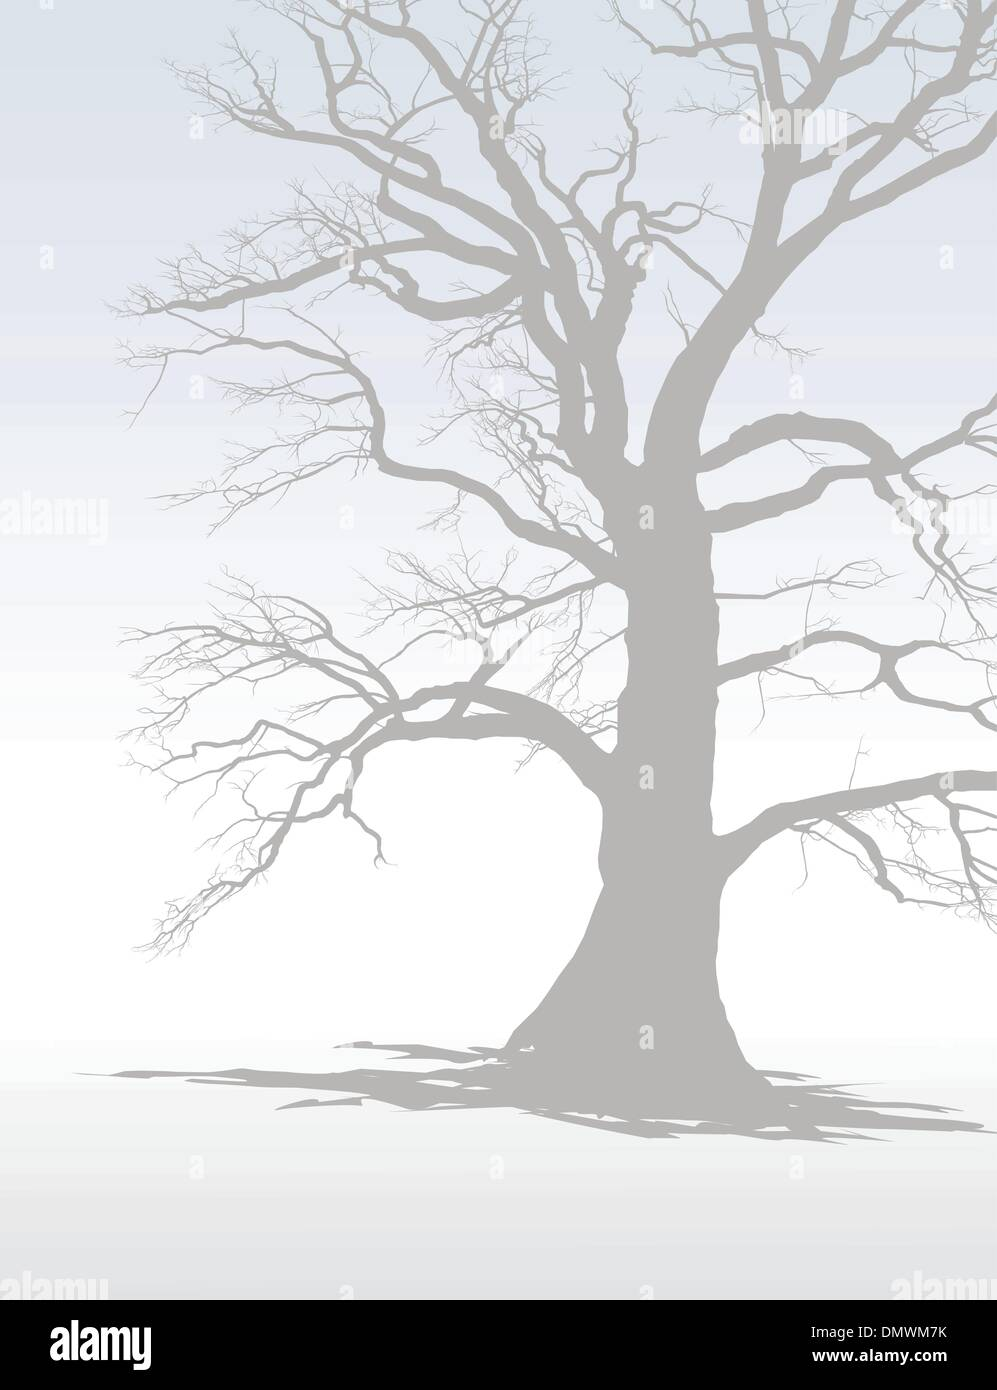 Baum im Winter Nebel Stock Vektor